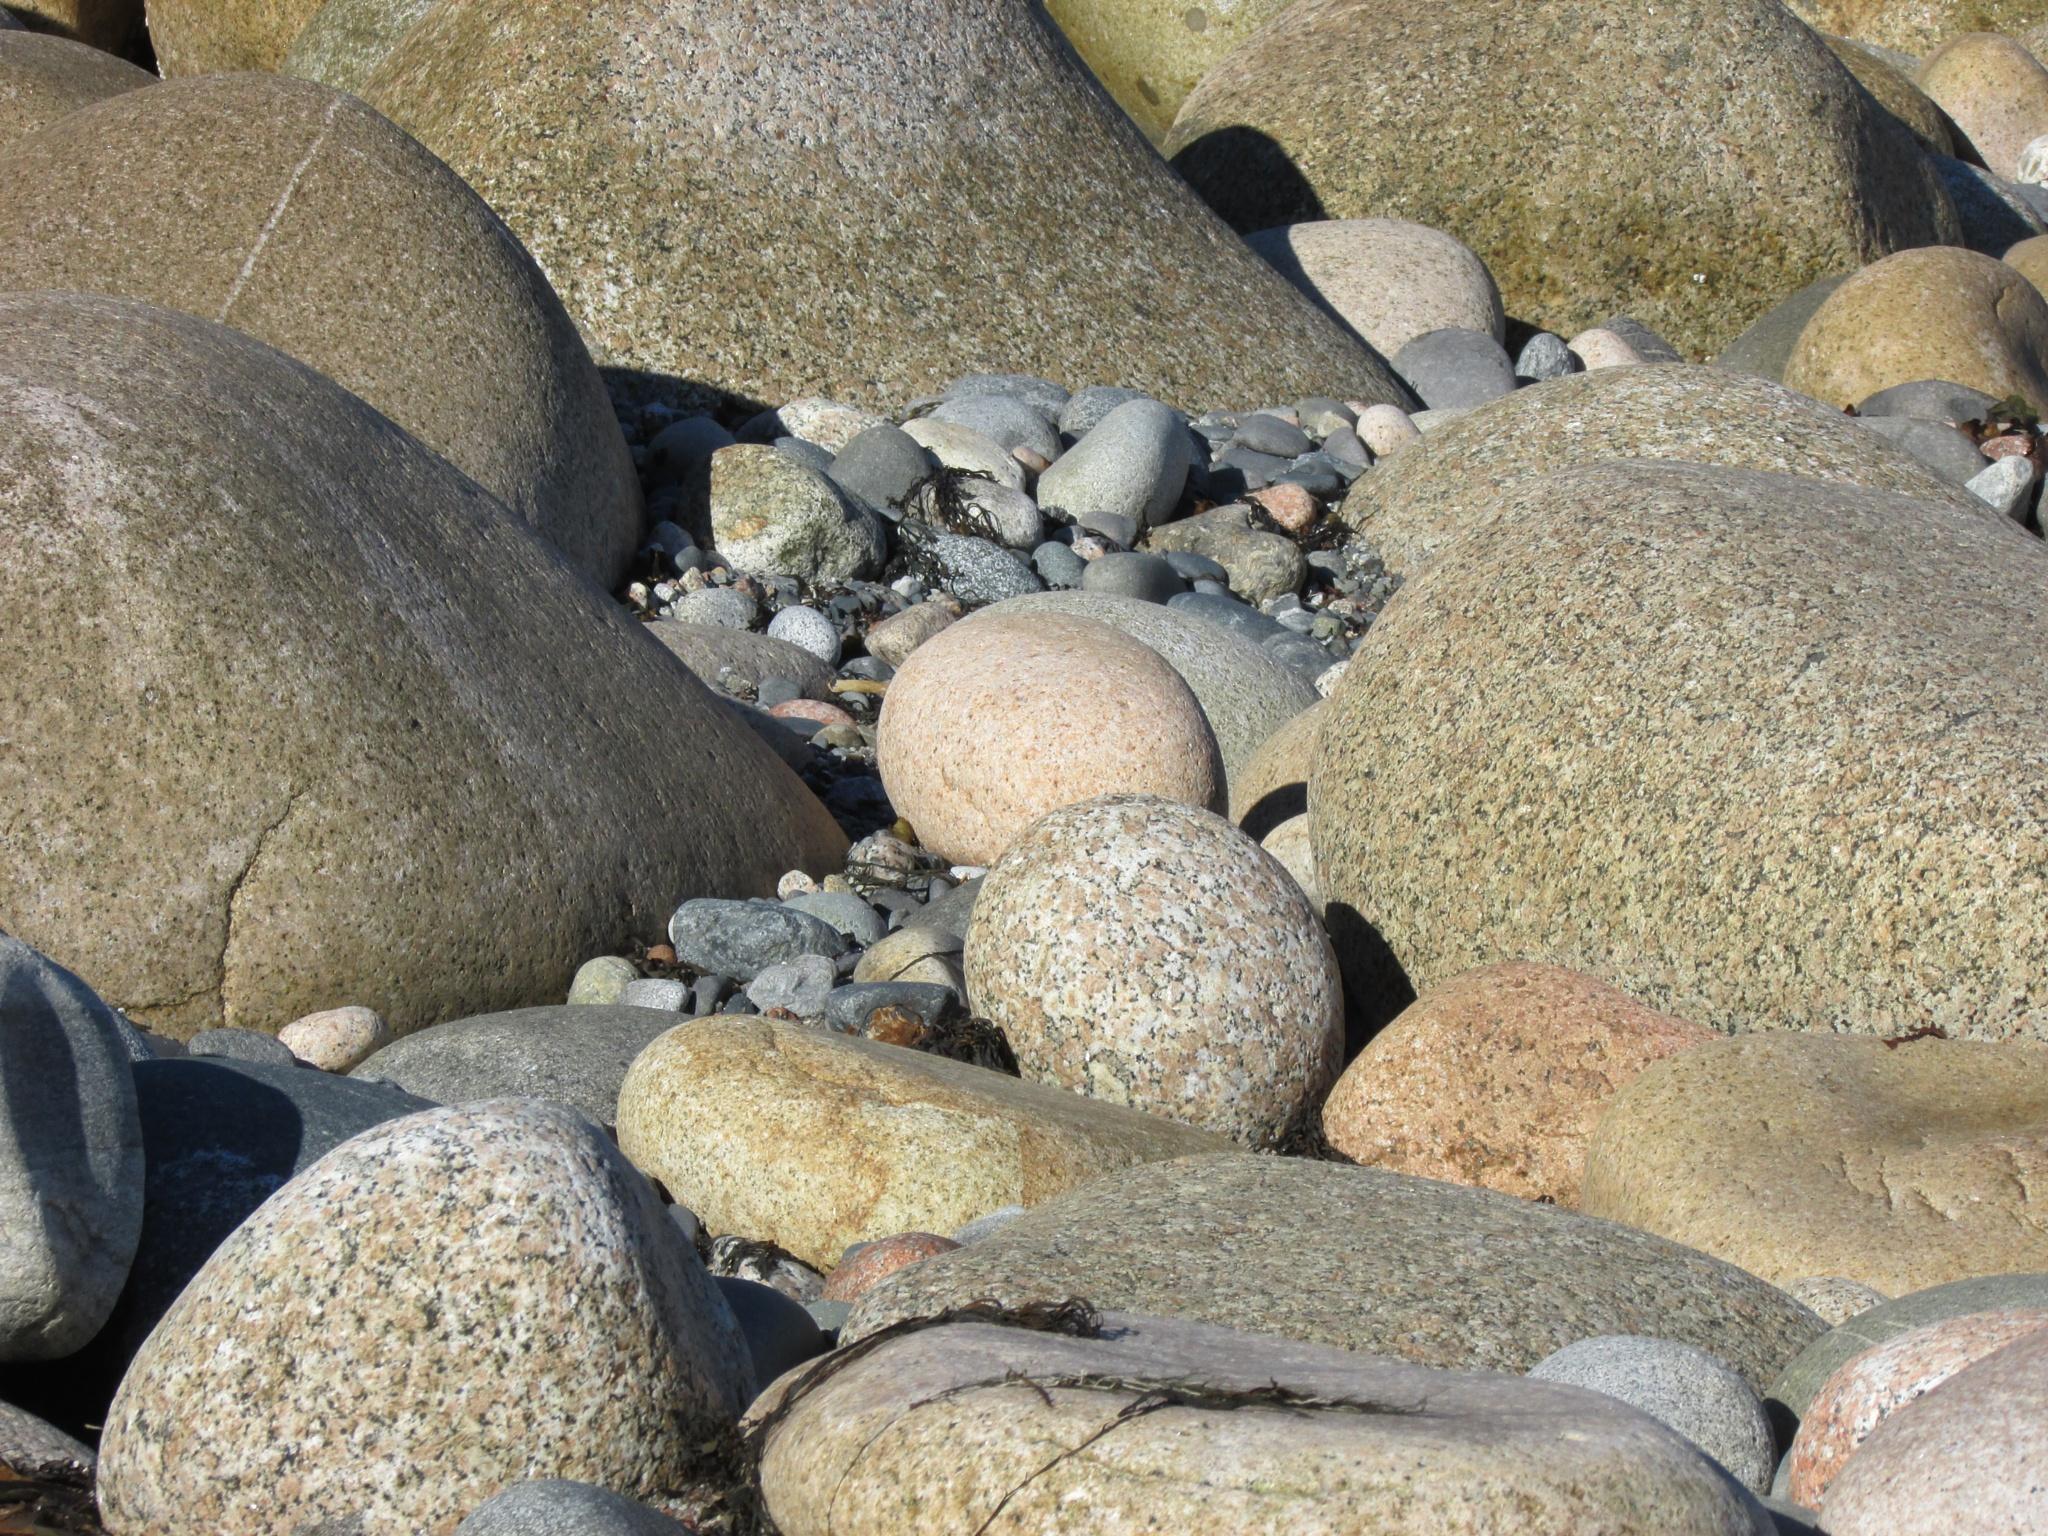 Nesting Rocks by beamer2home